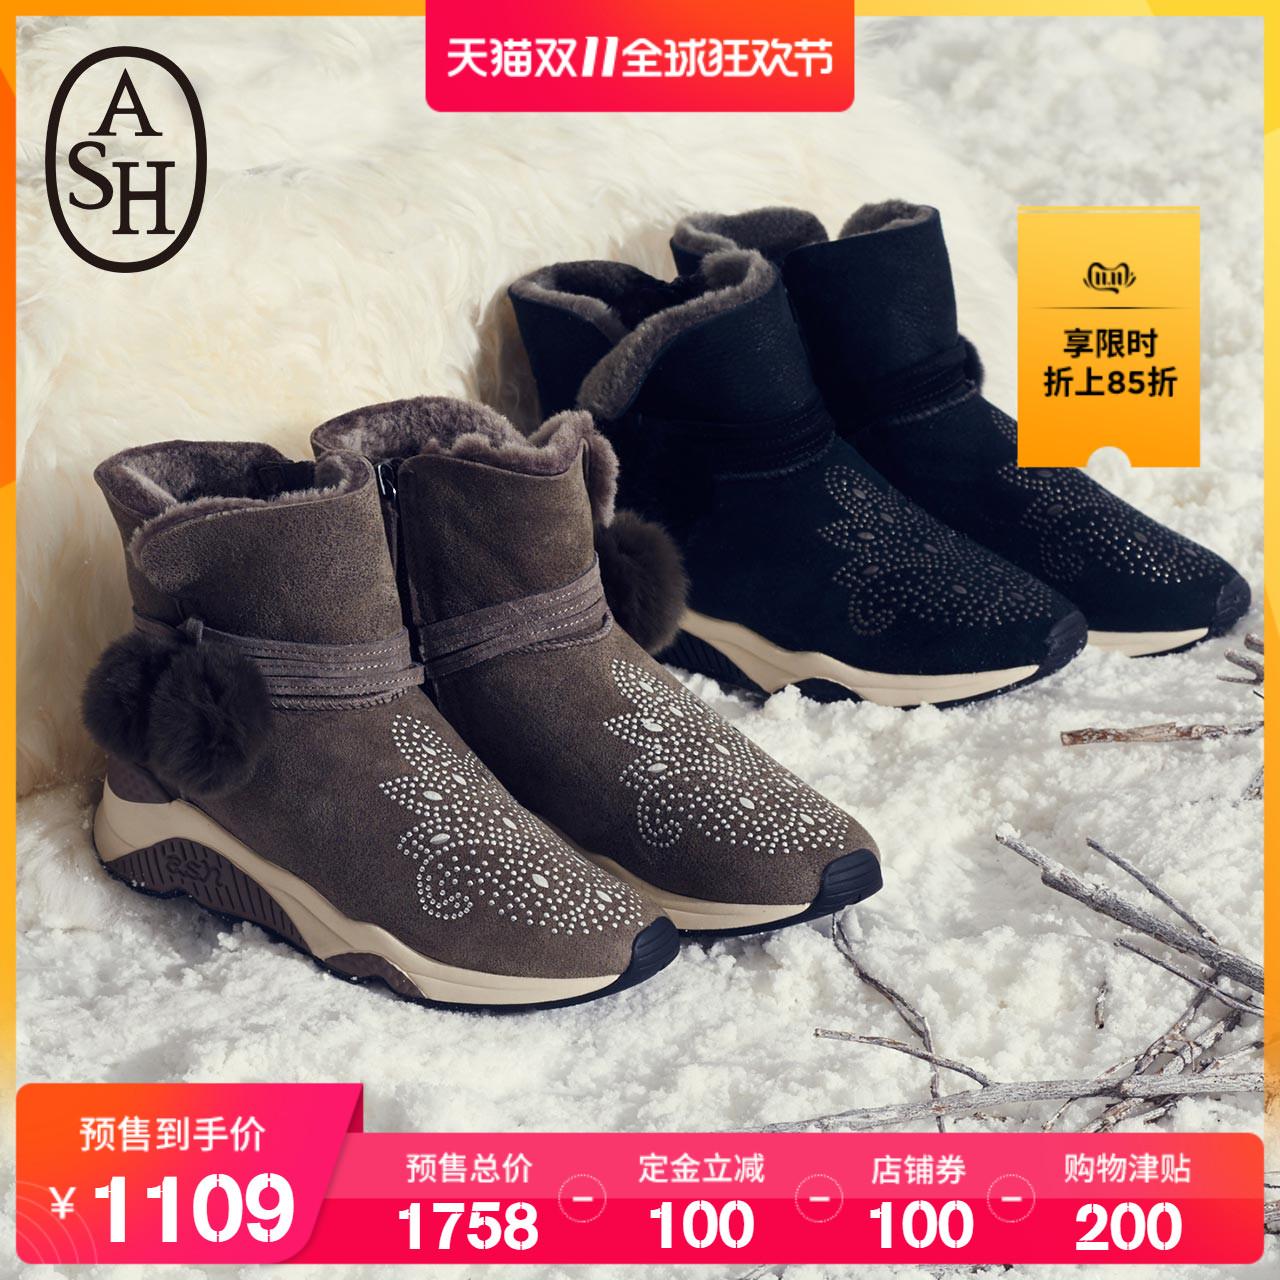 ASH女鞋冬季款MARIKA钉珠装饰短筒运动增高雪地靴女 thumbnail